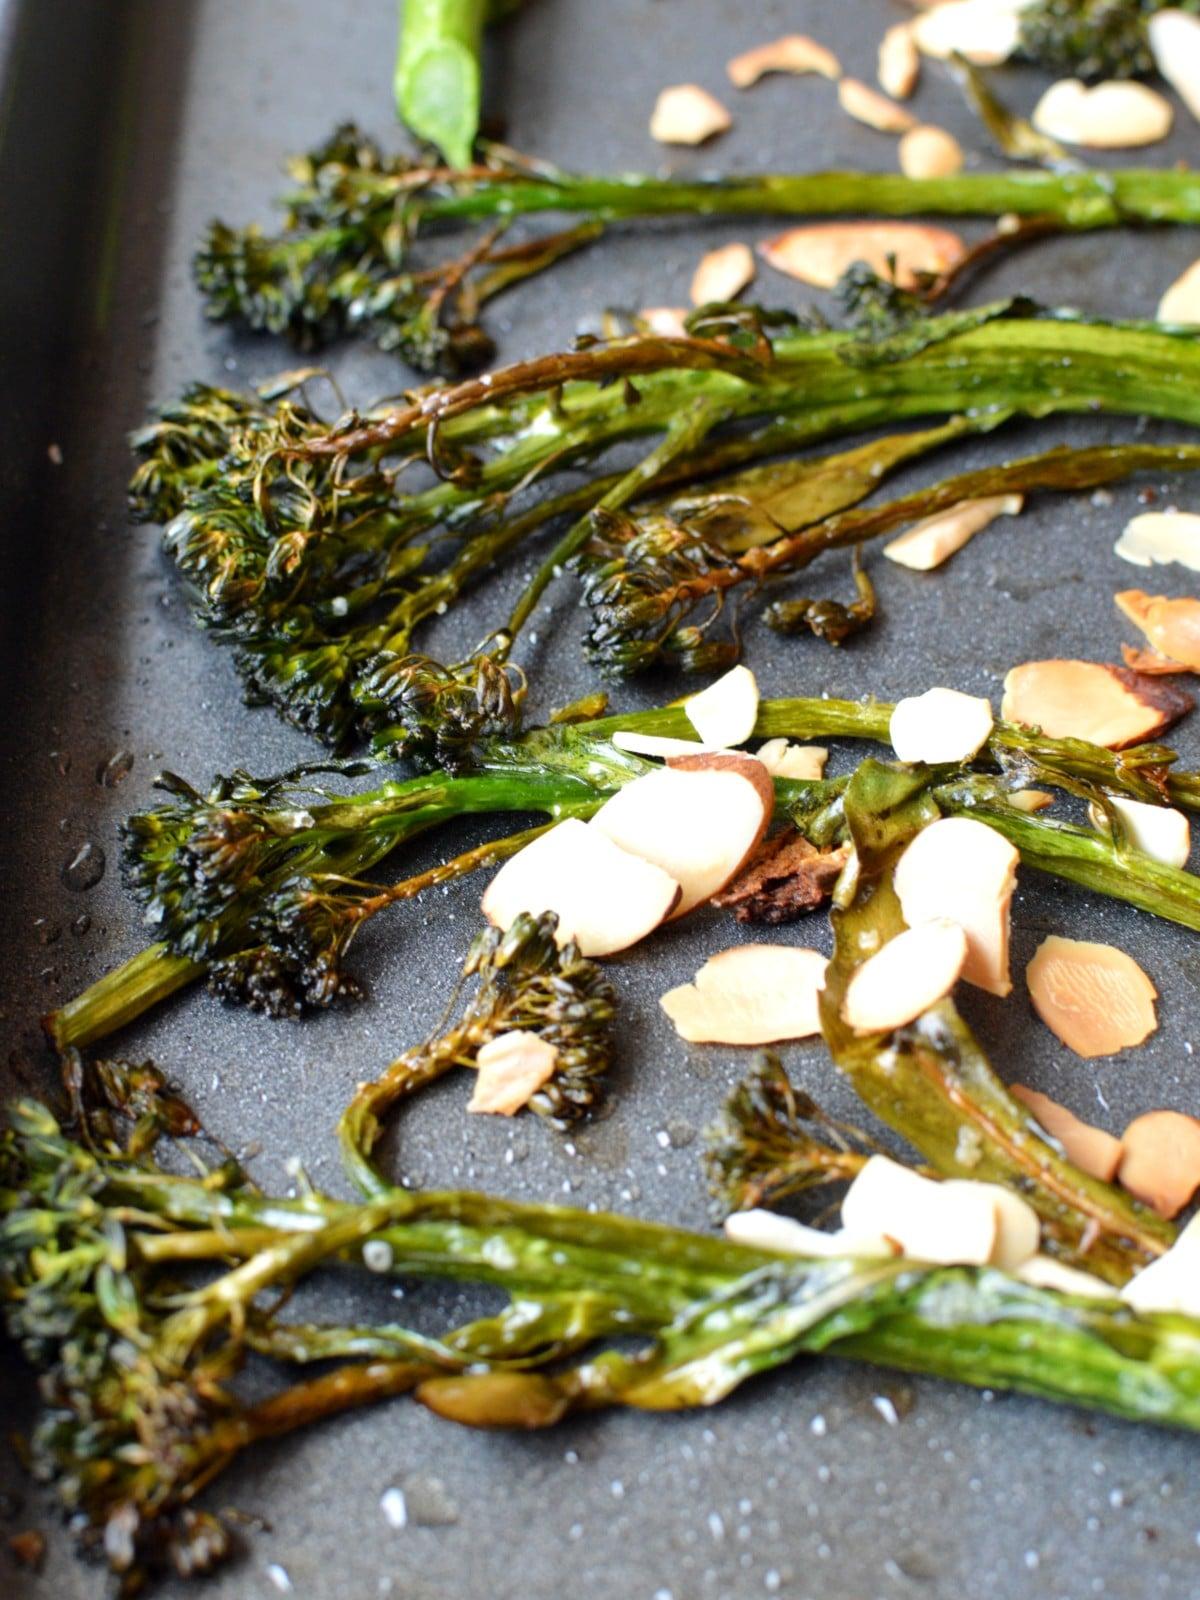 Roasted tenderstem broccoli with sliced almonds